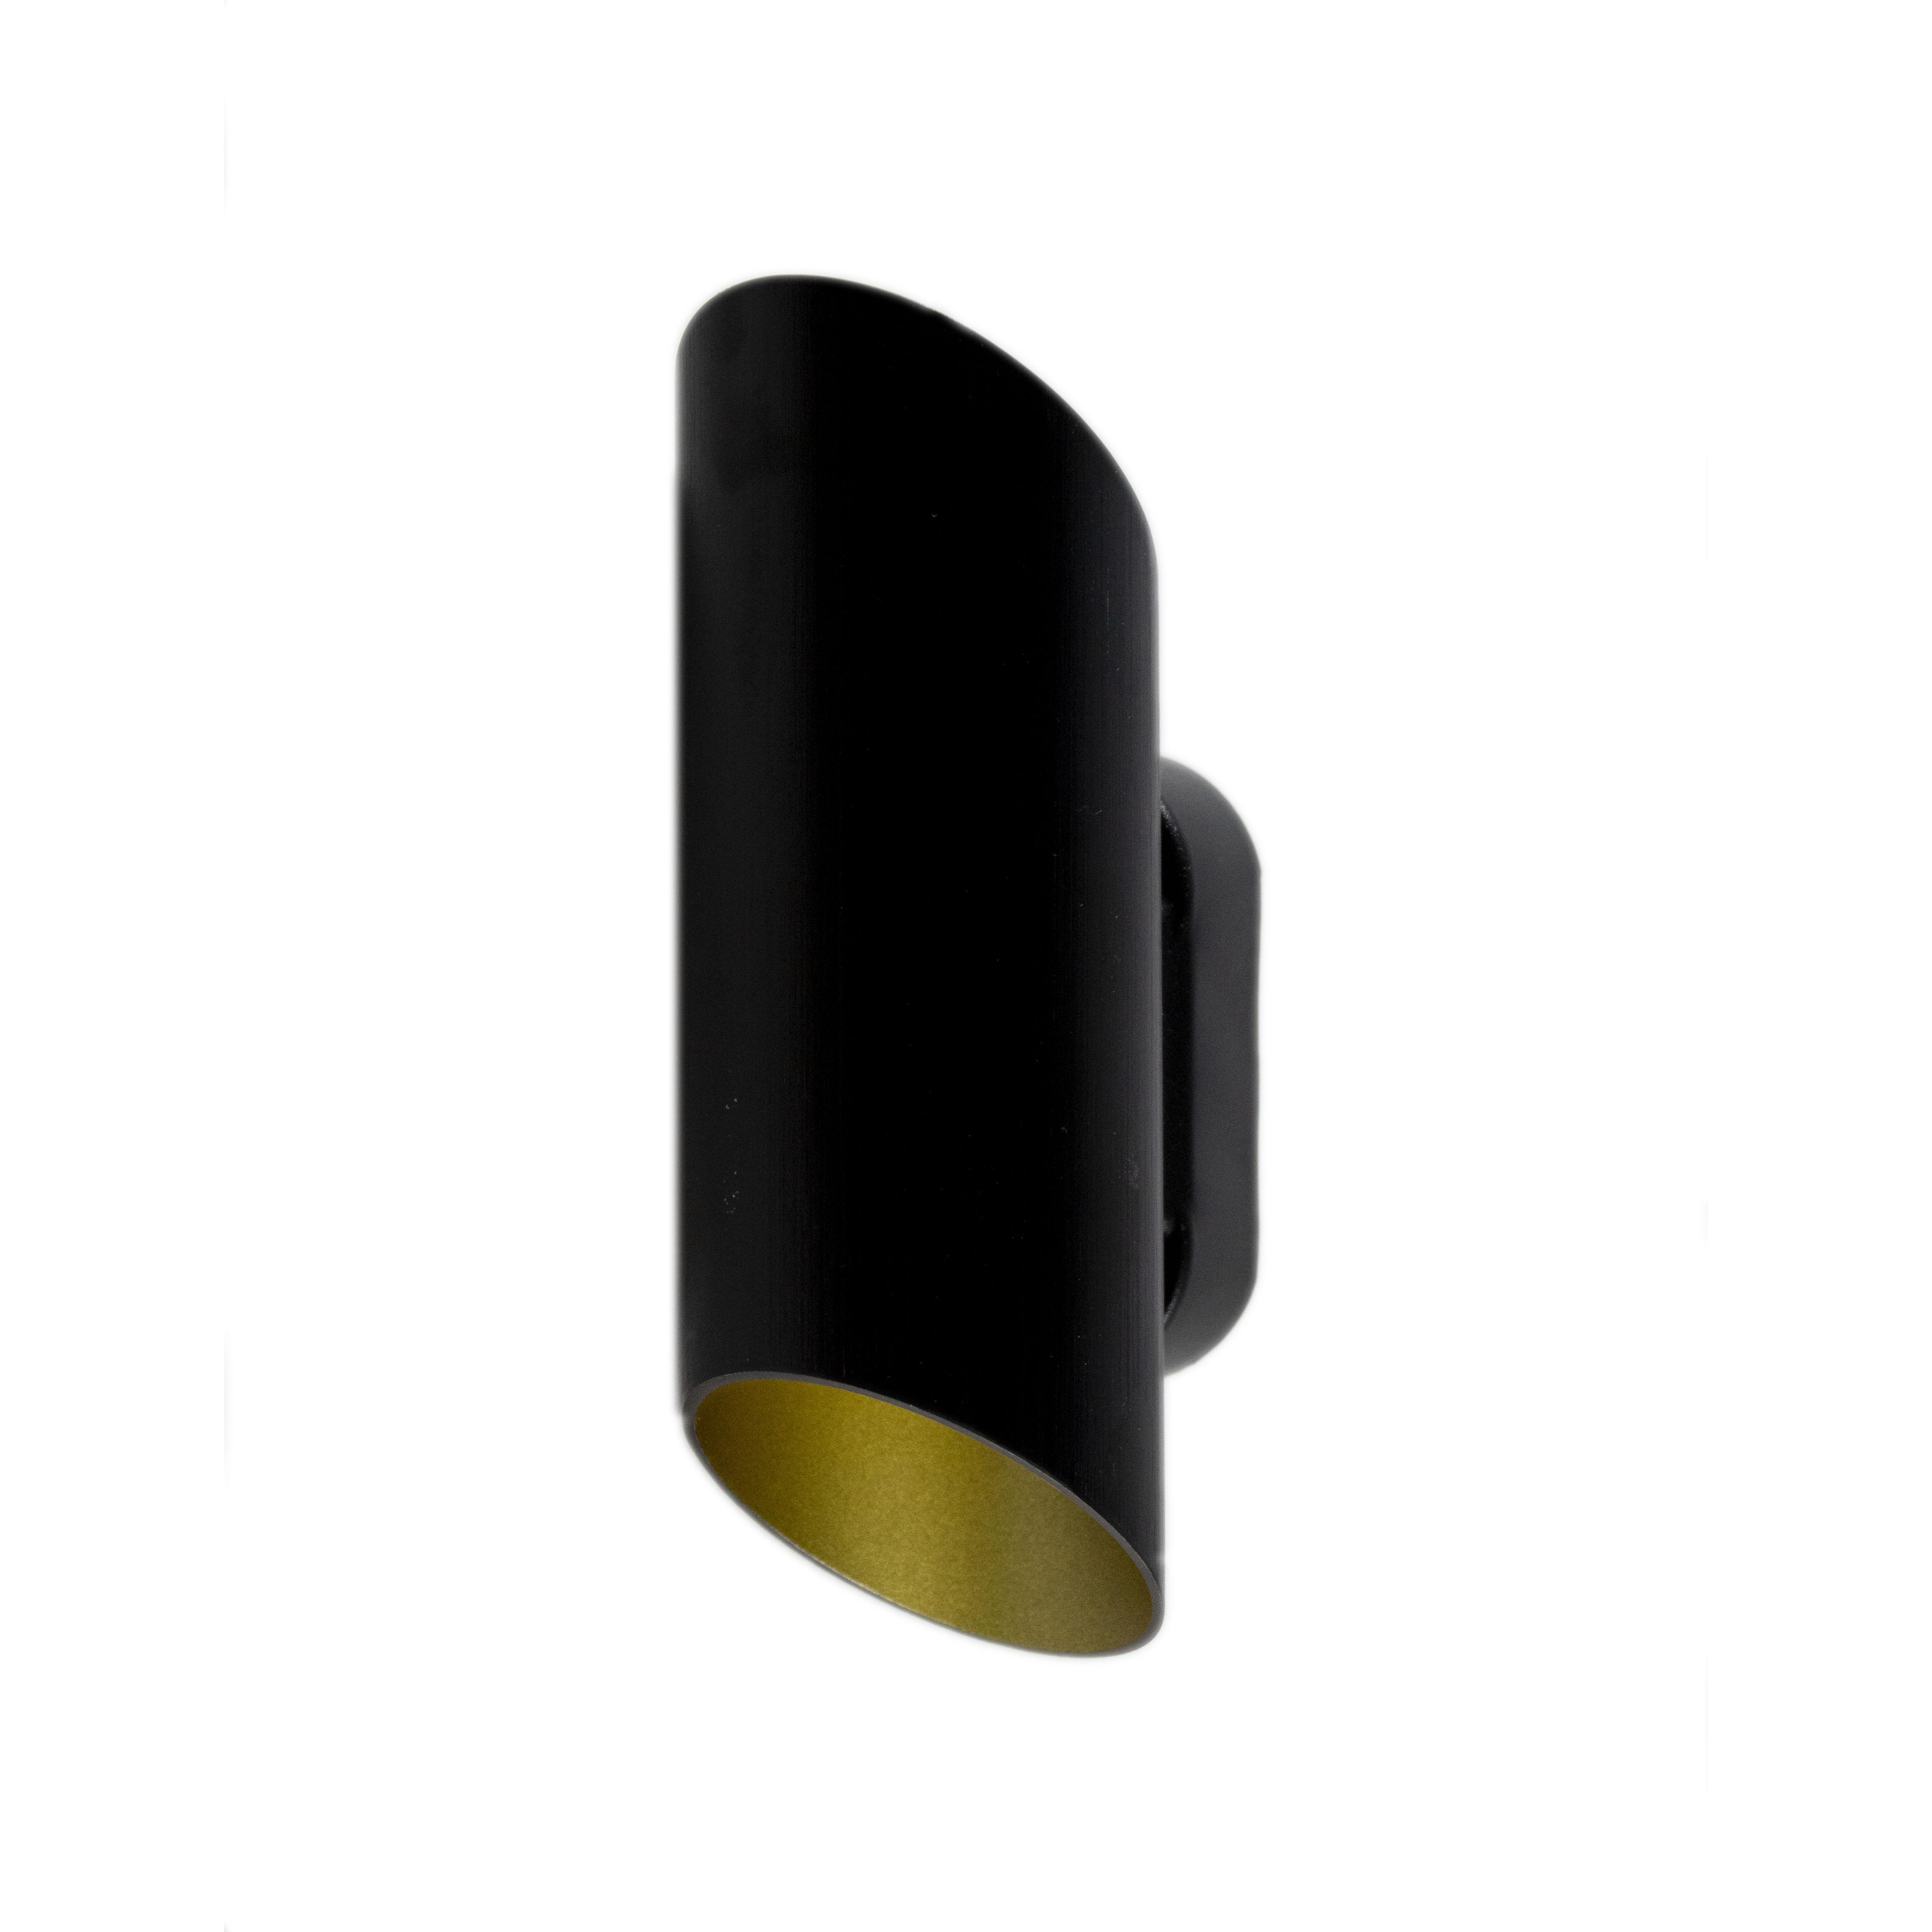 Wandlamp Led Rond zwart goud G9 fitting - lamp uit